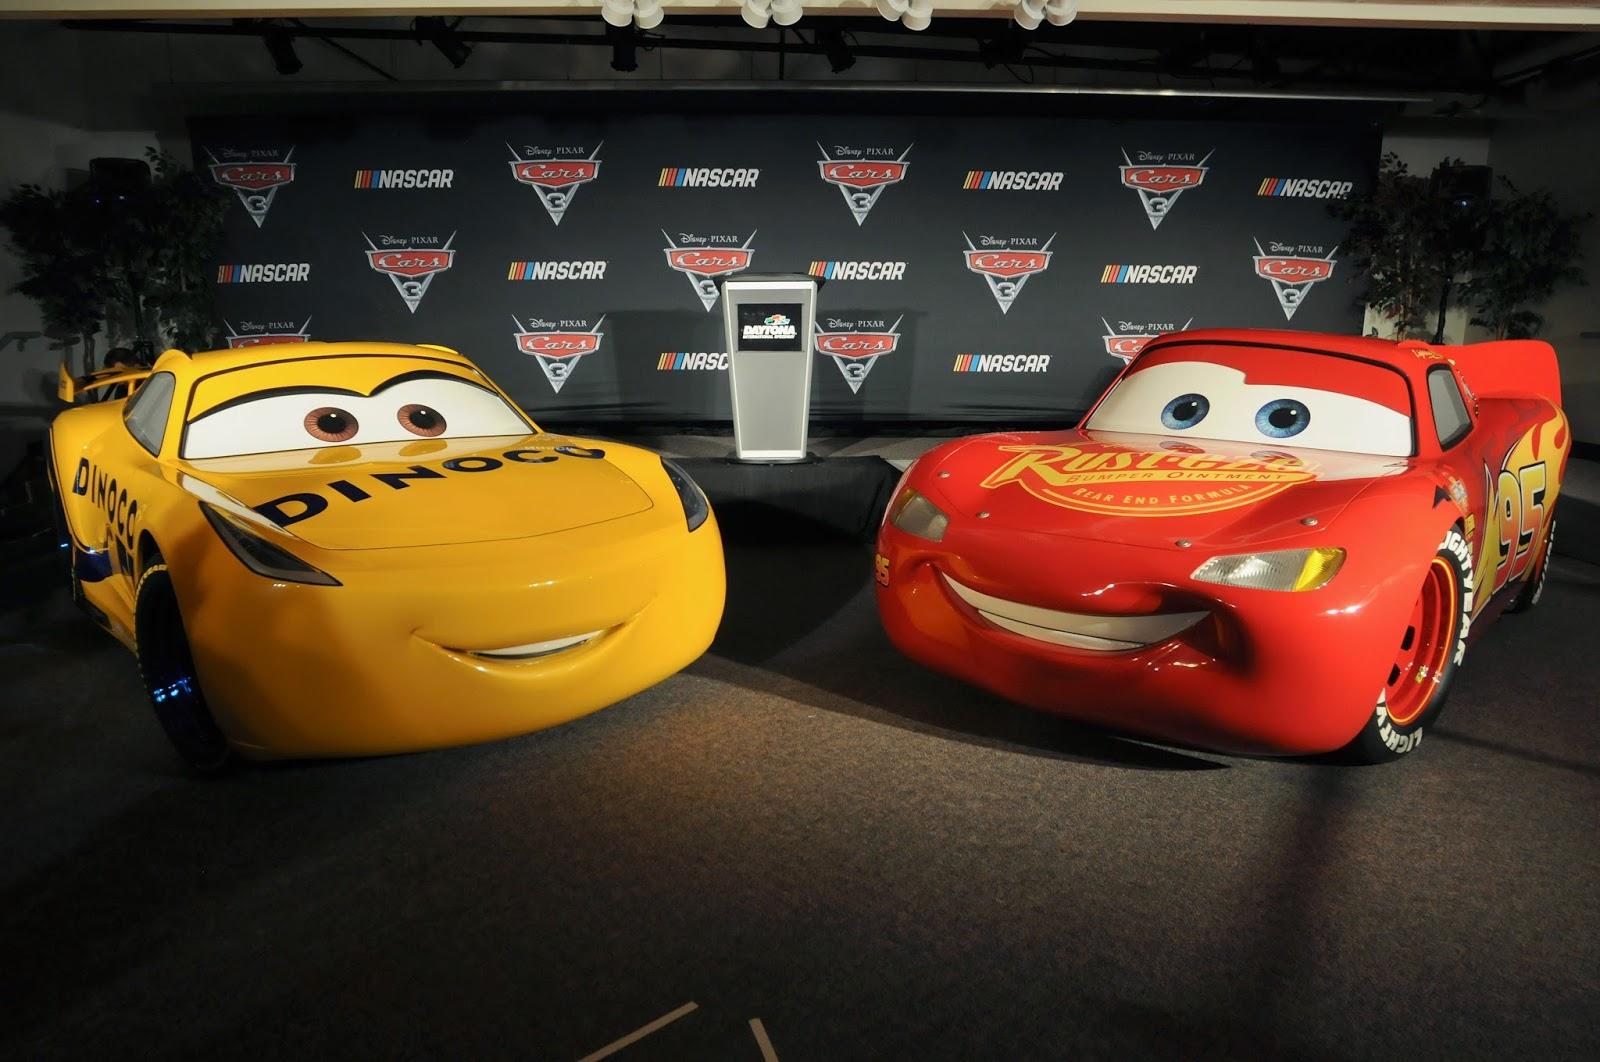 cars 3 news nascar press event unveils life size dinoco. Black Bedroom Furniture Sets. Home Design Ideas